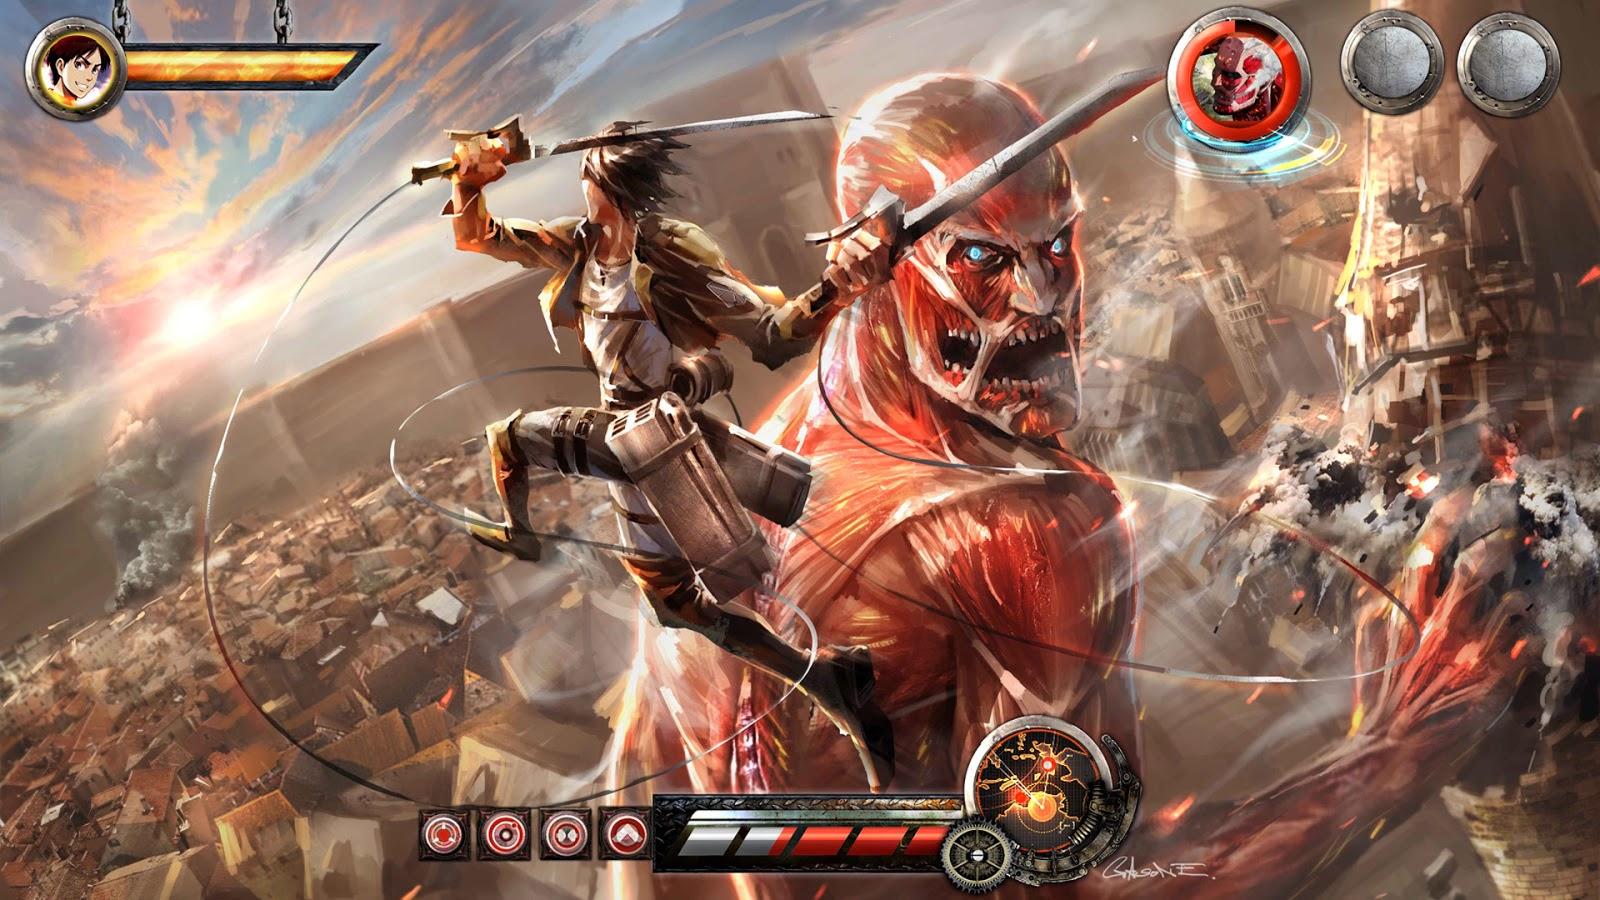 49 Attack On Titan Eren Wallpaper On Wallpapersafari